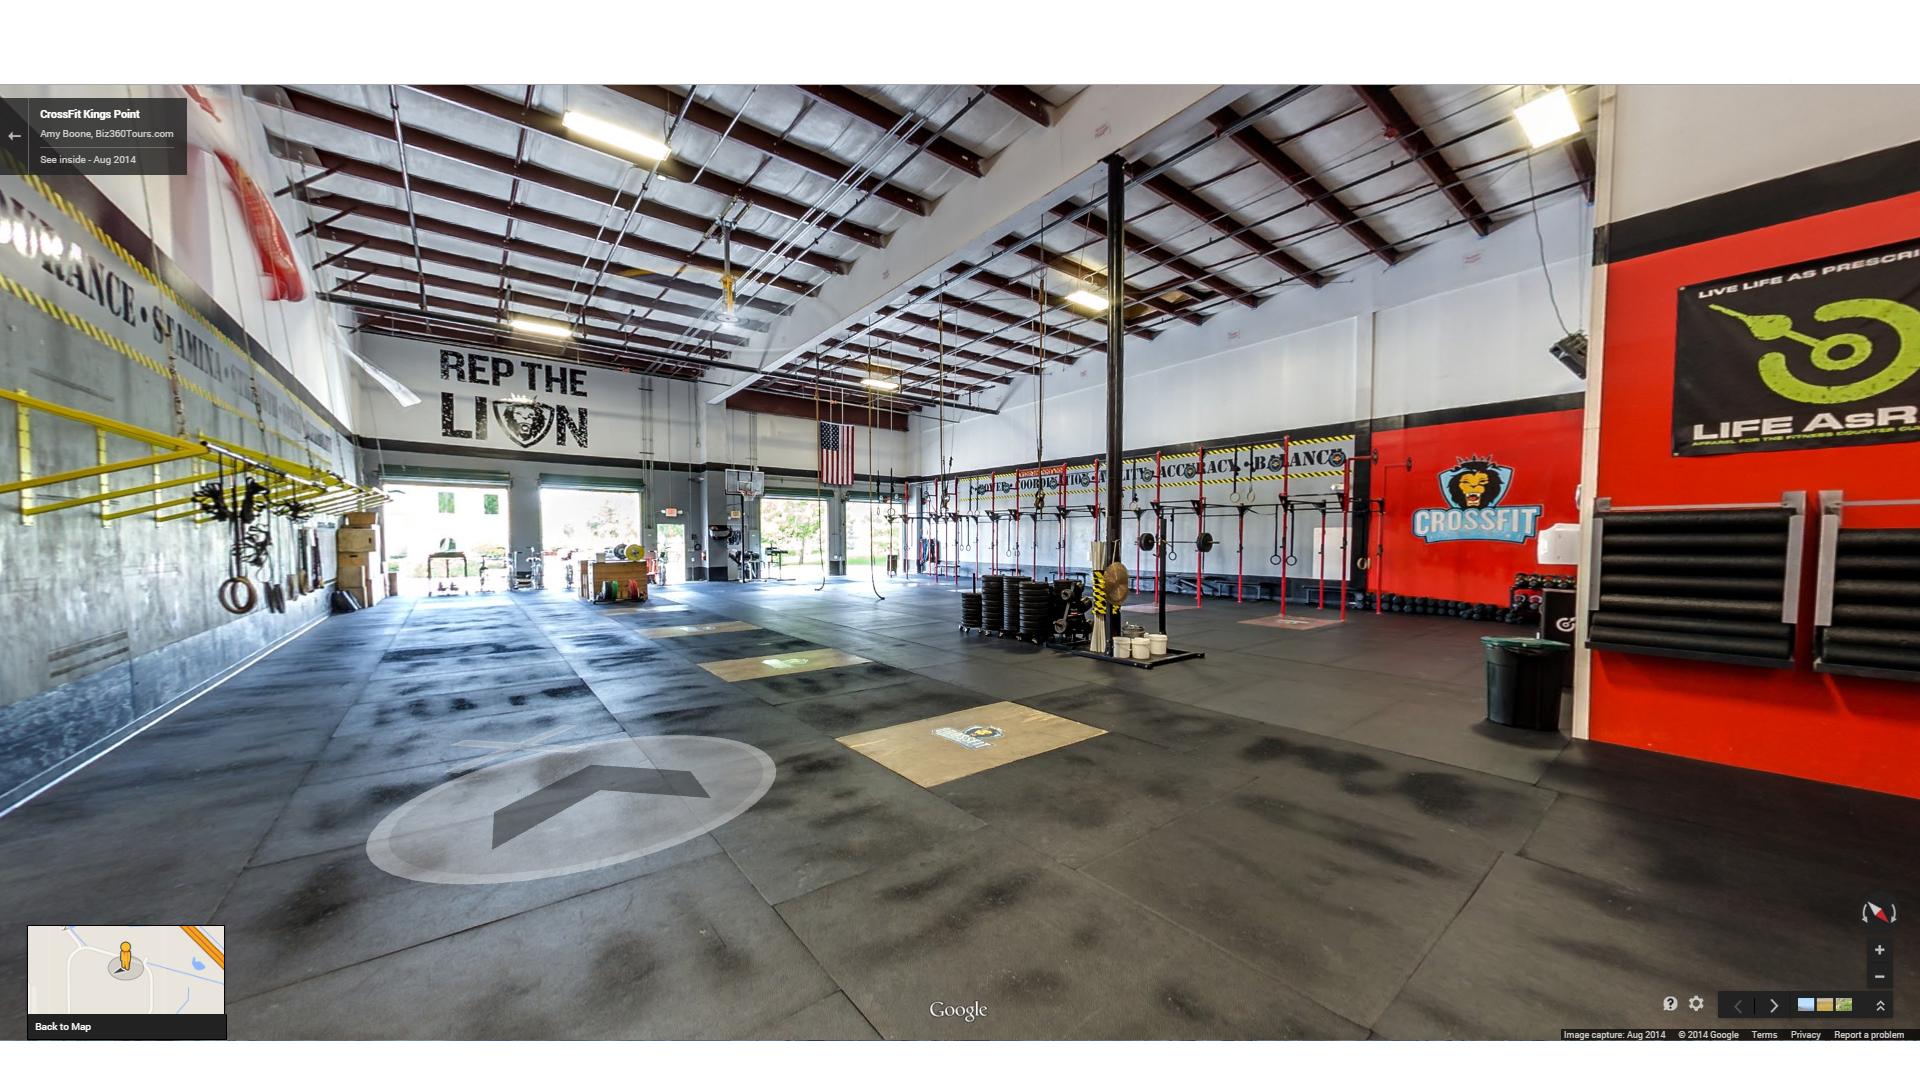 Crossfit Kings Point - Biz360Tours - Google Maps Orlando Florida Street View